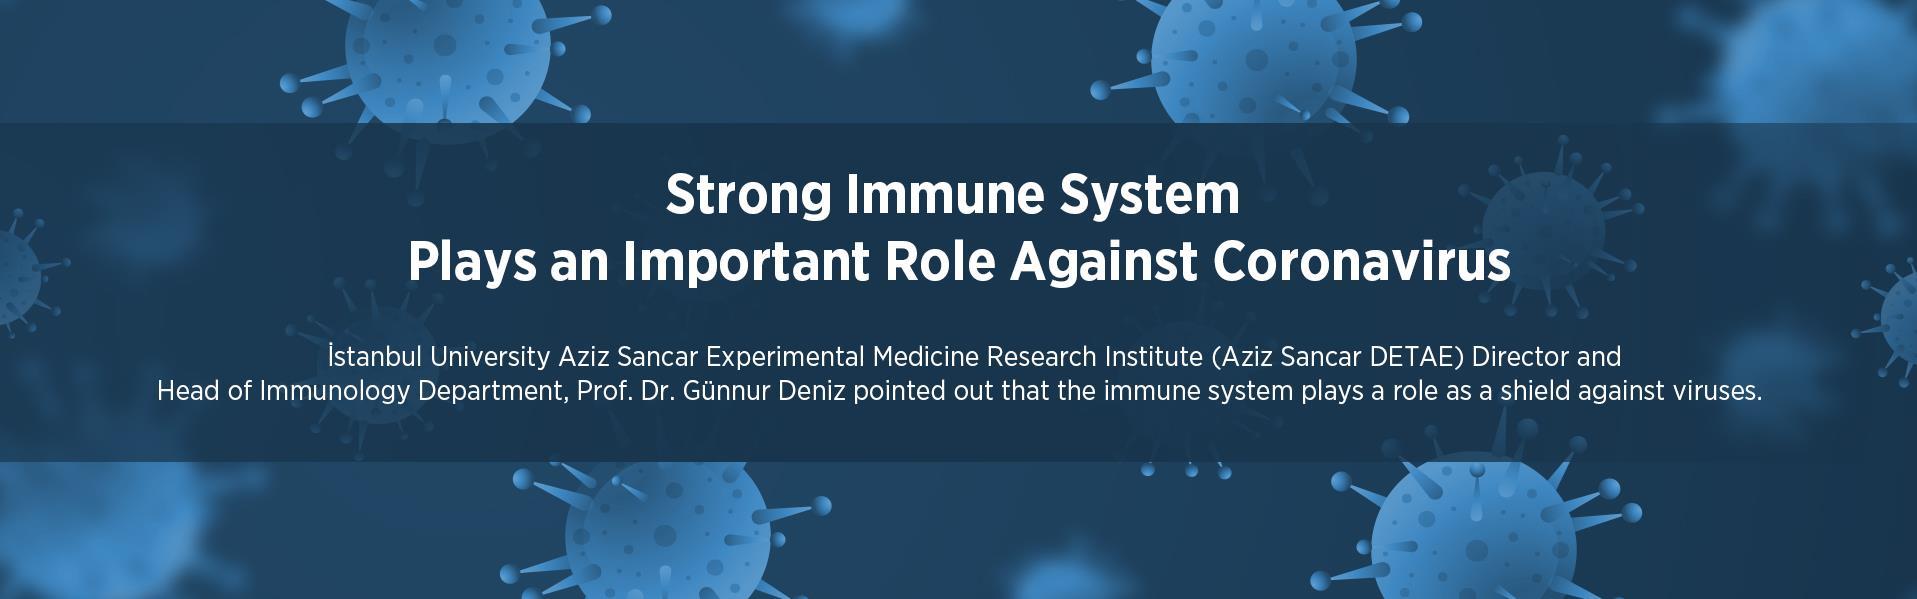 immune-system COVID-19 coronavirus